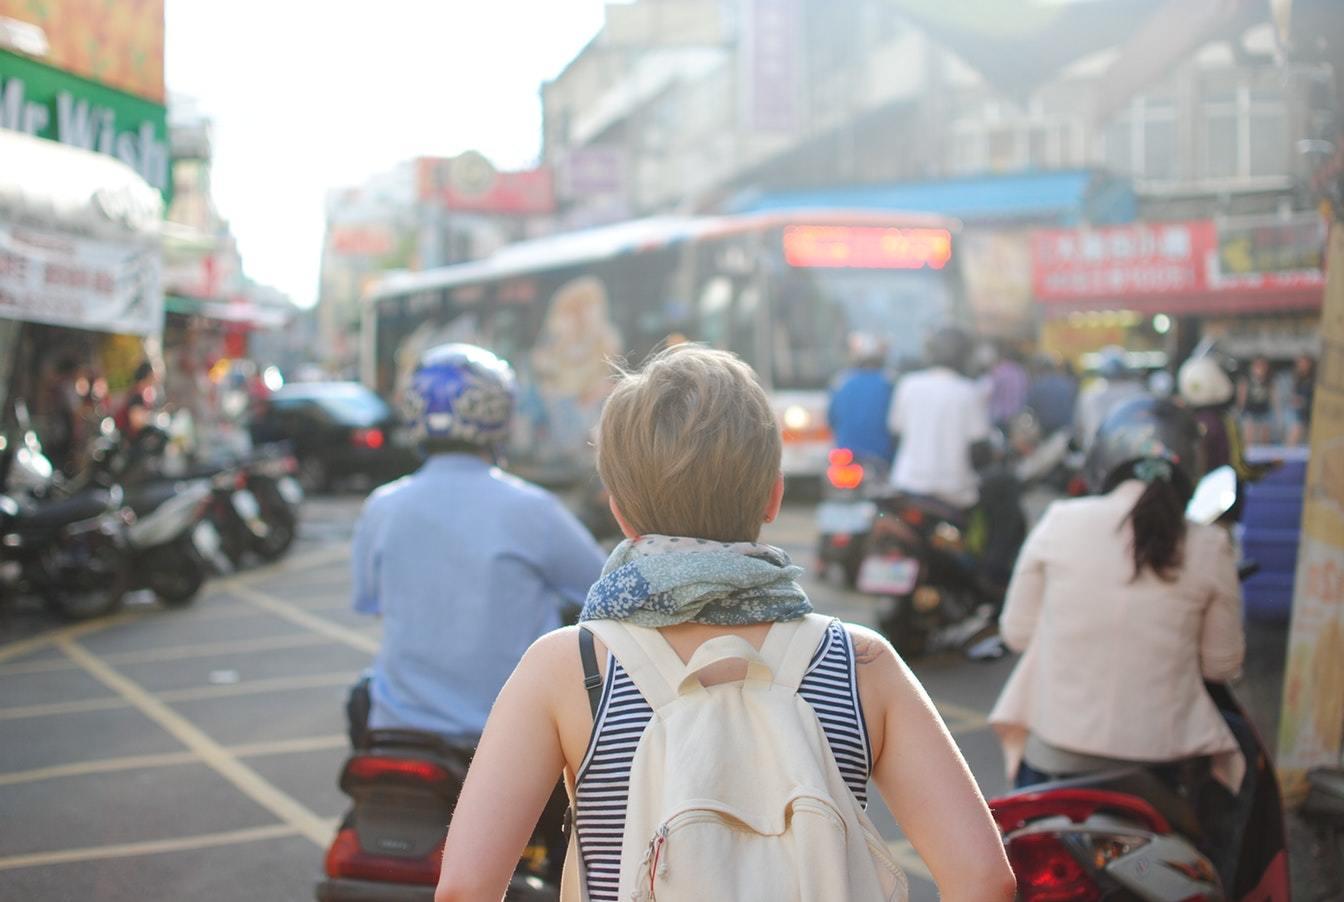 Millenial travel